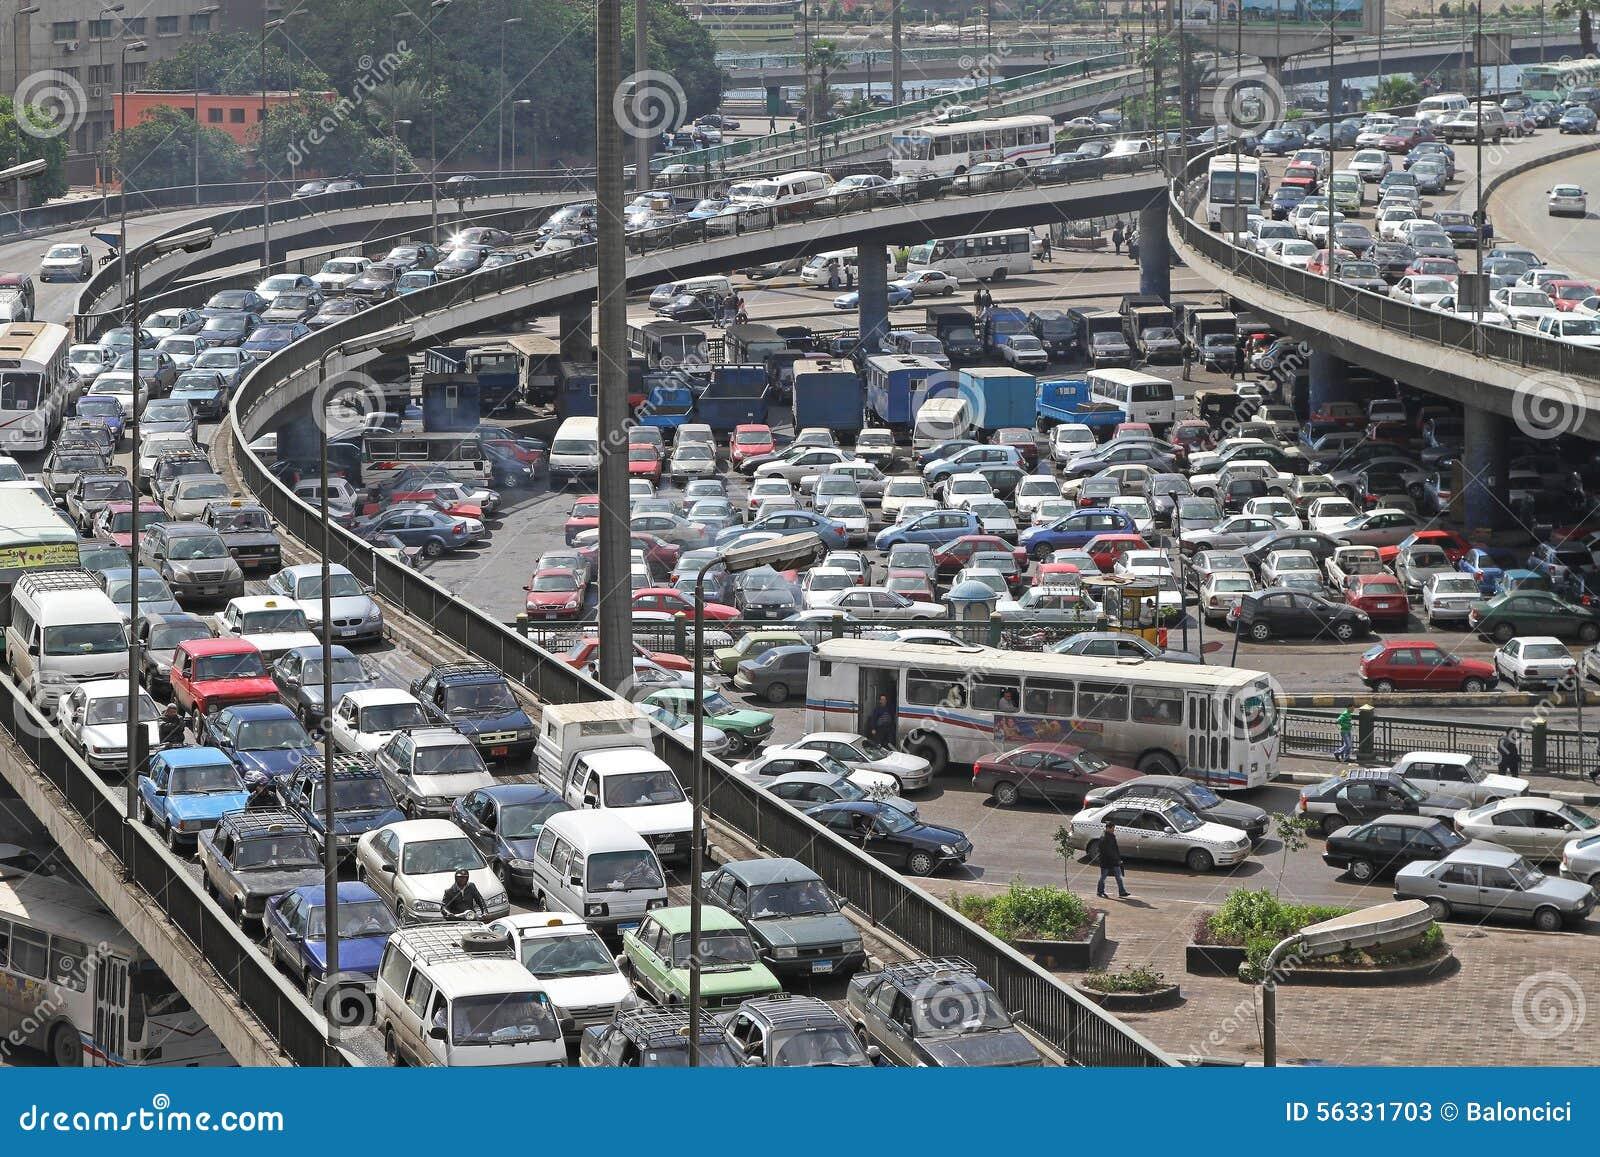 Traffic Jam Cairo Editorial Stock Photo - Image: 56331703